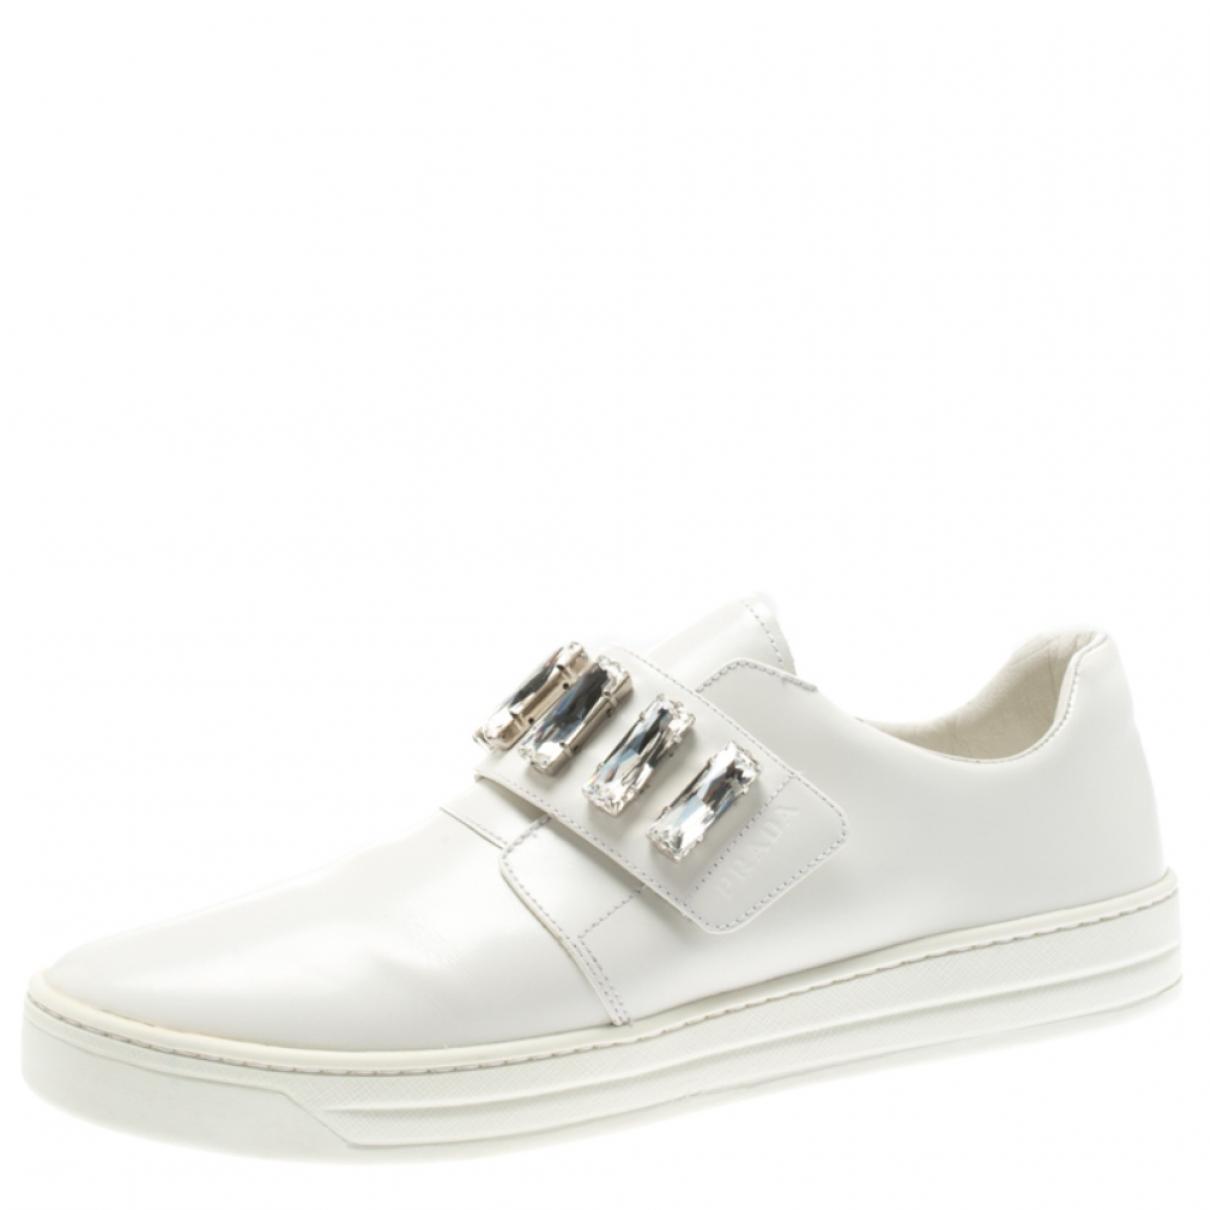 Prada \N White Leather Flats for Women 9 US